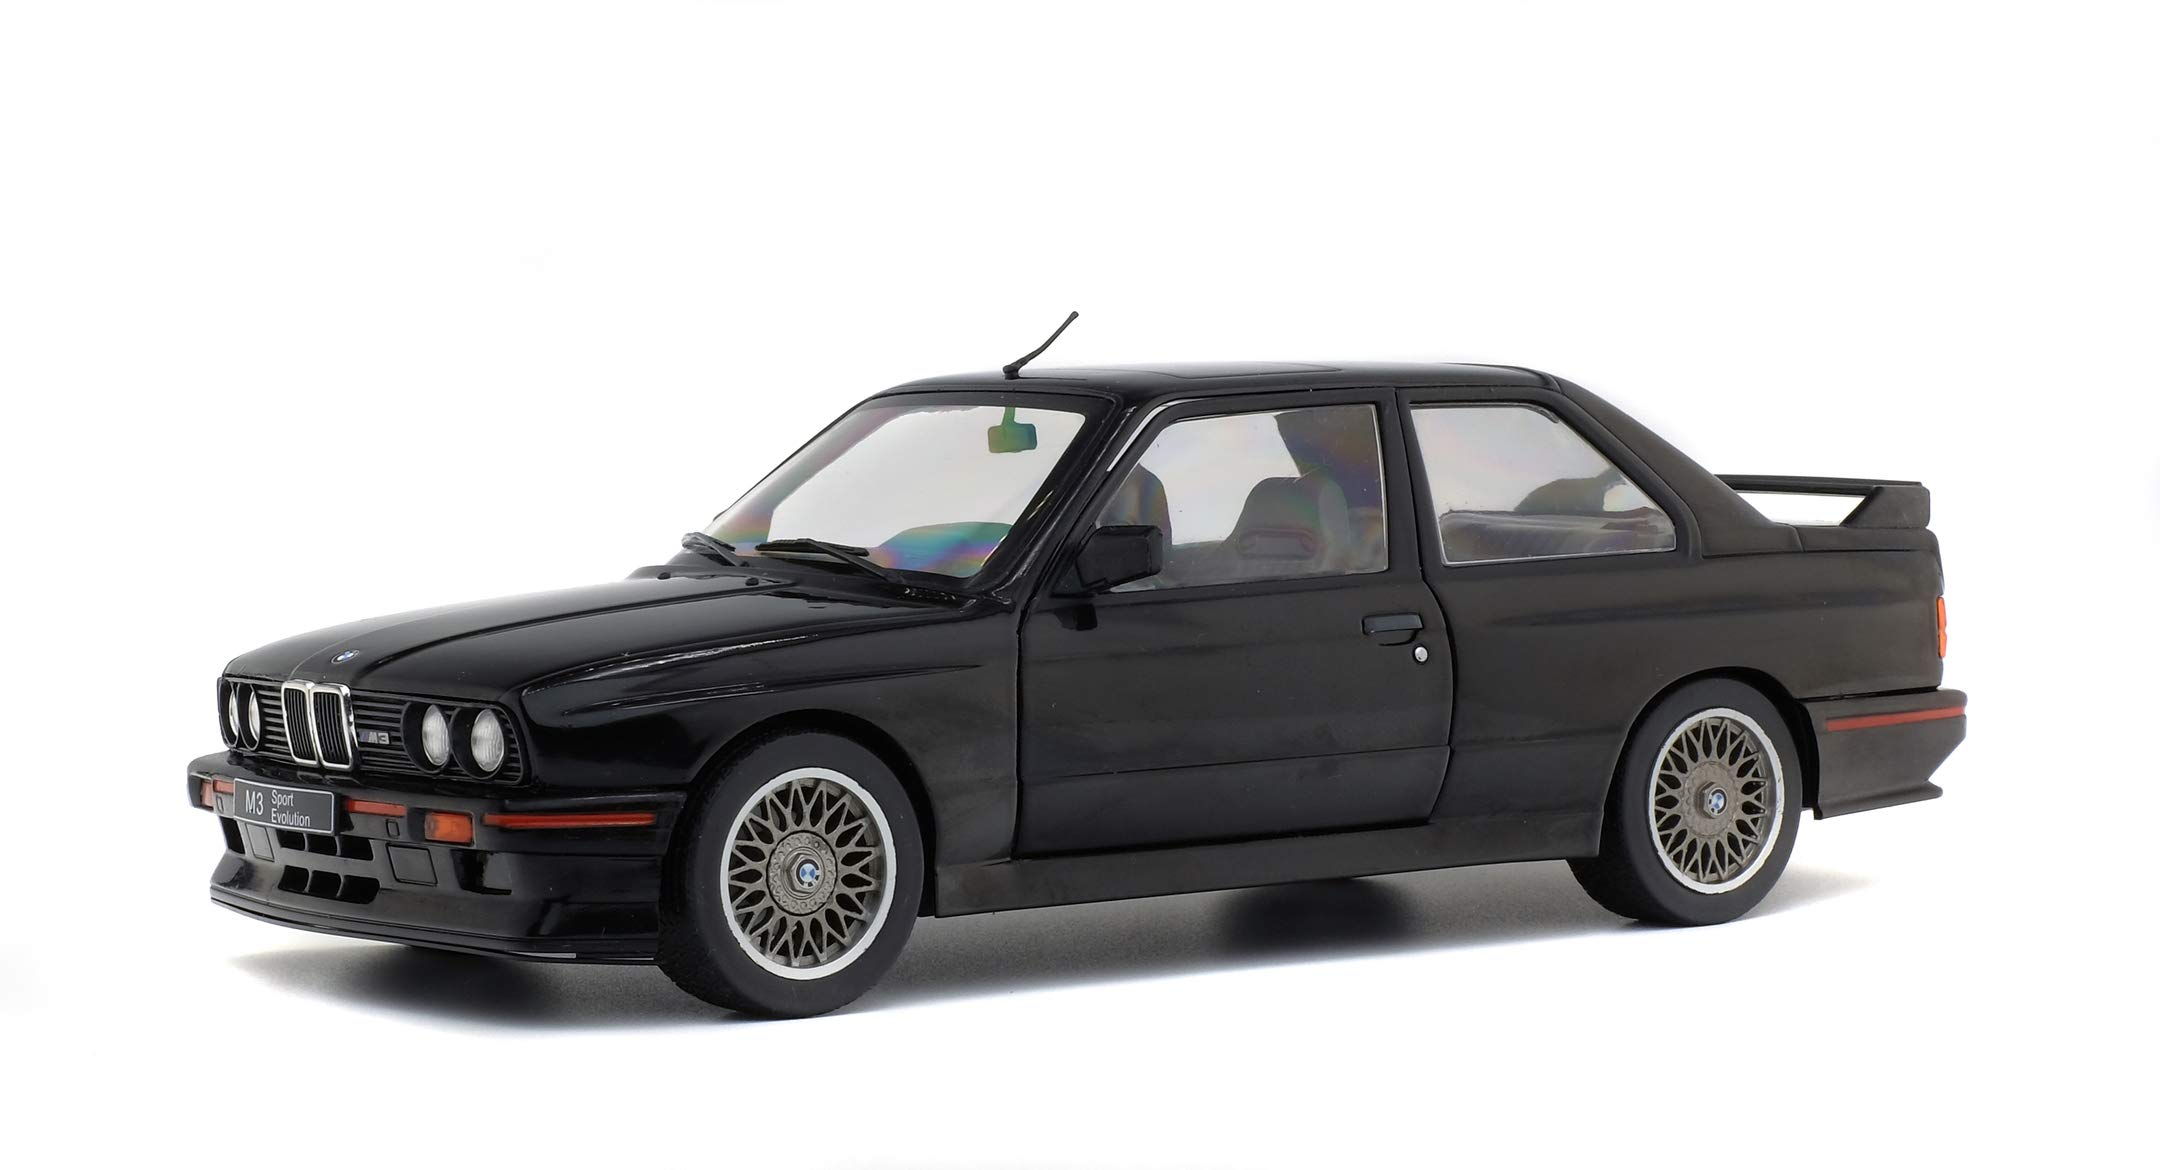 Solido 421184380 Black 1: 18 1990 BMW E30 Sport EVO, One Size